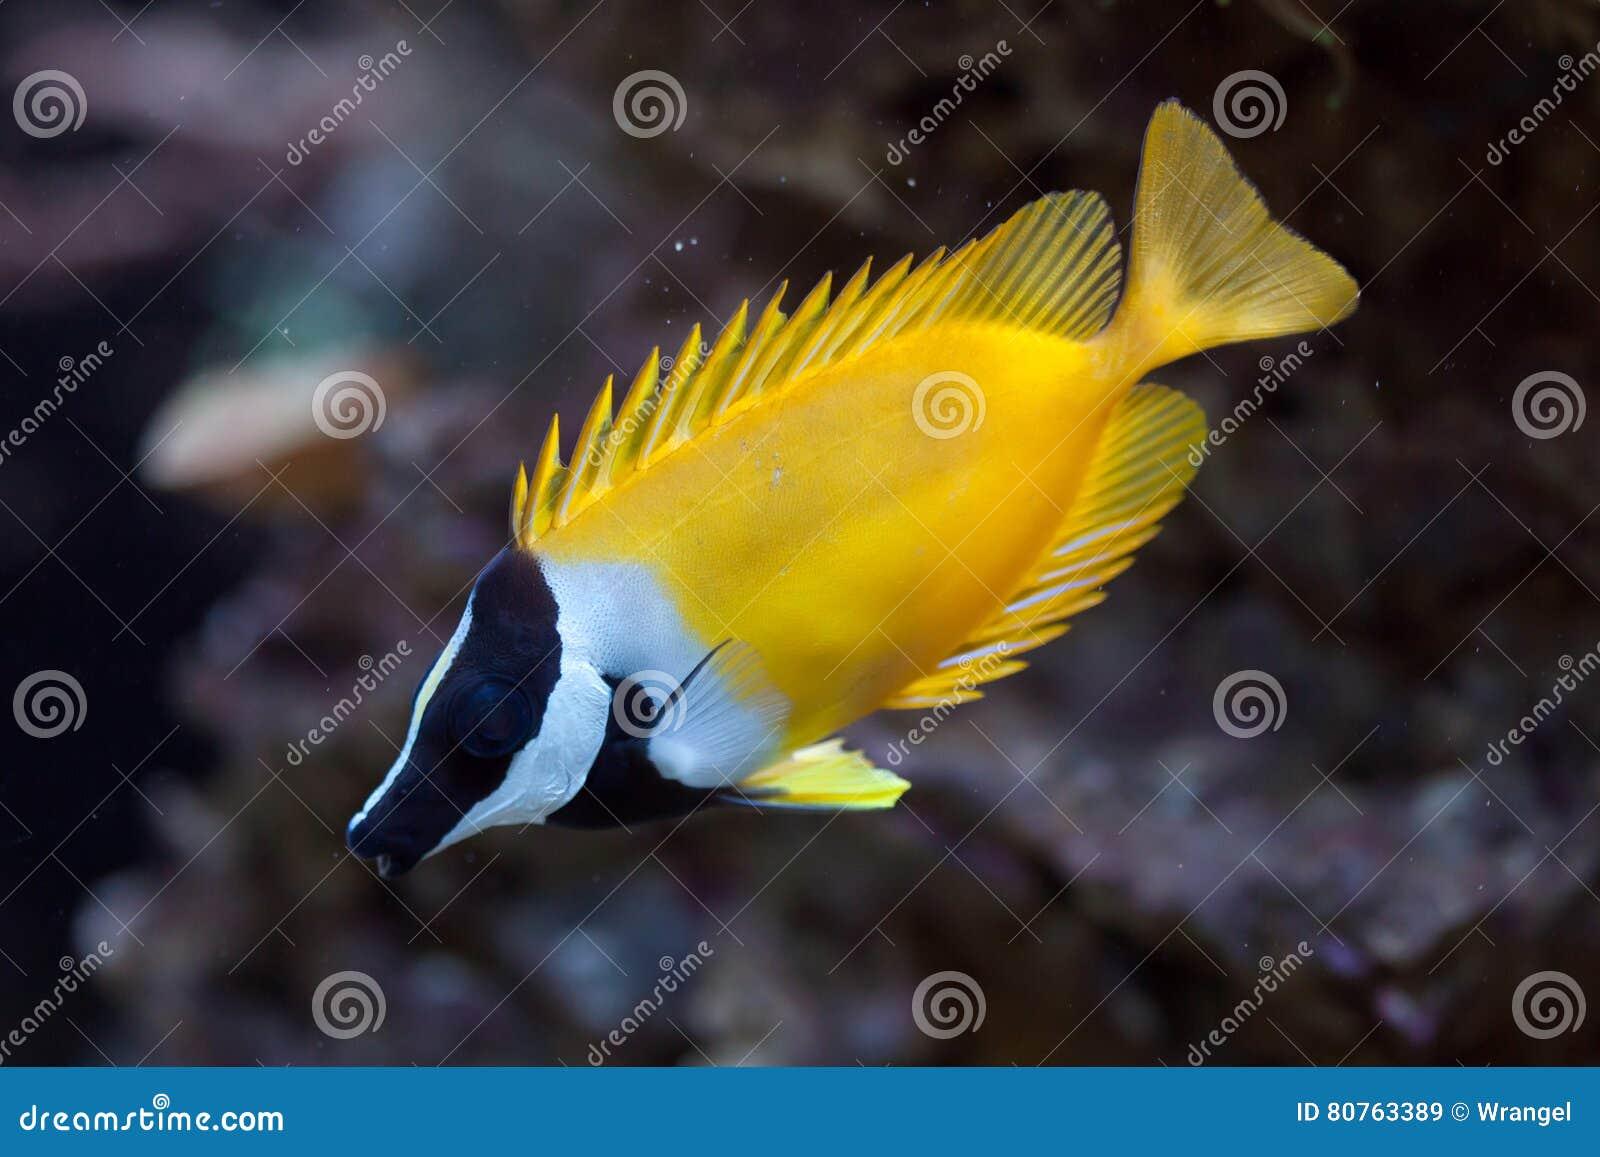 foxface rabbitfish siganus vulpinus stock image image of corals